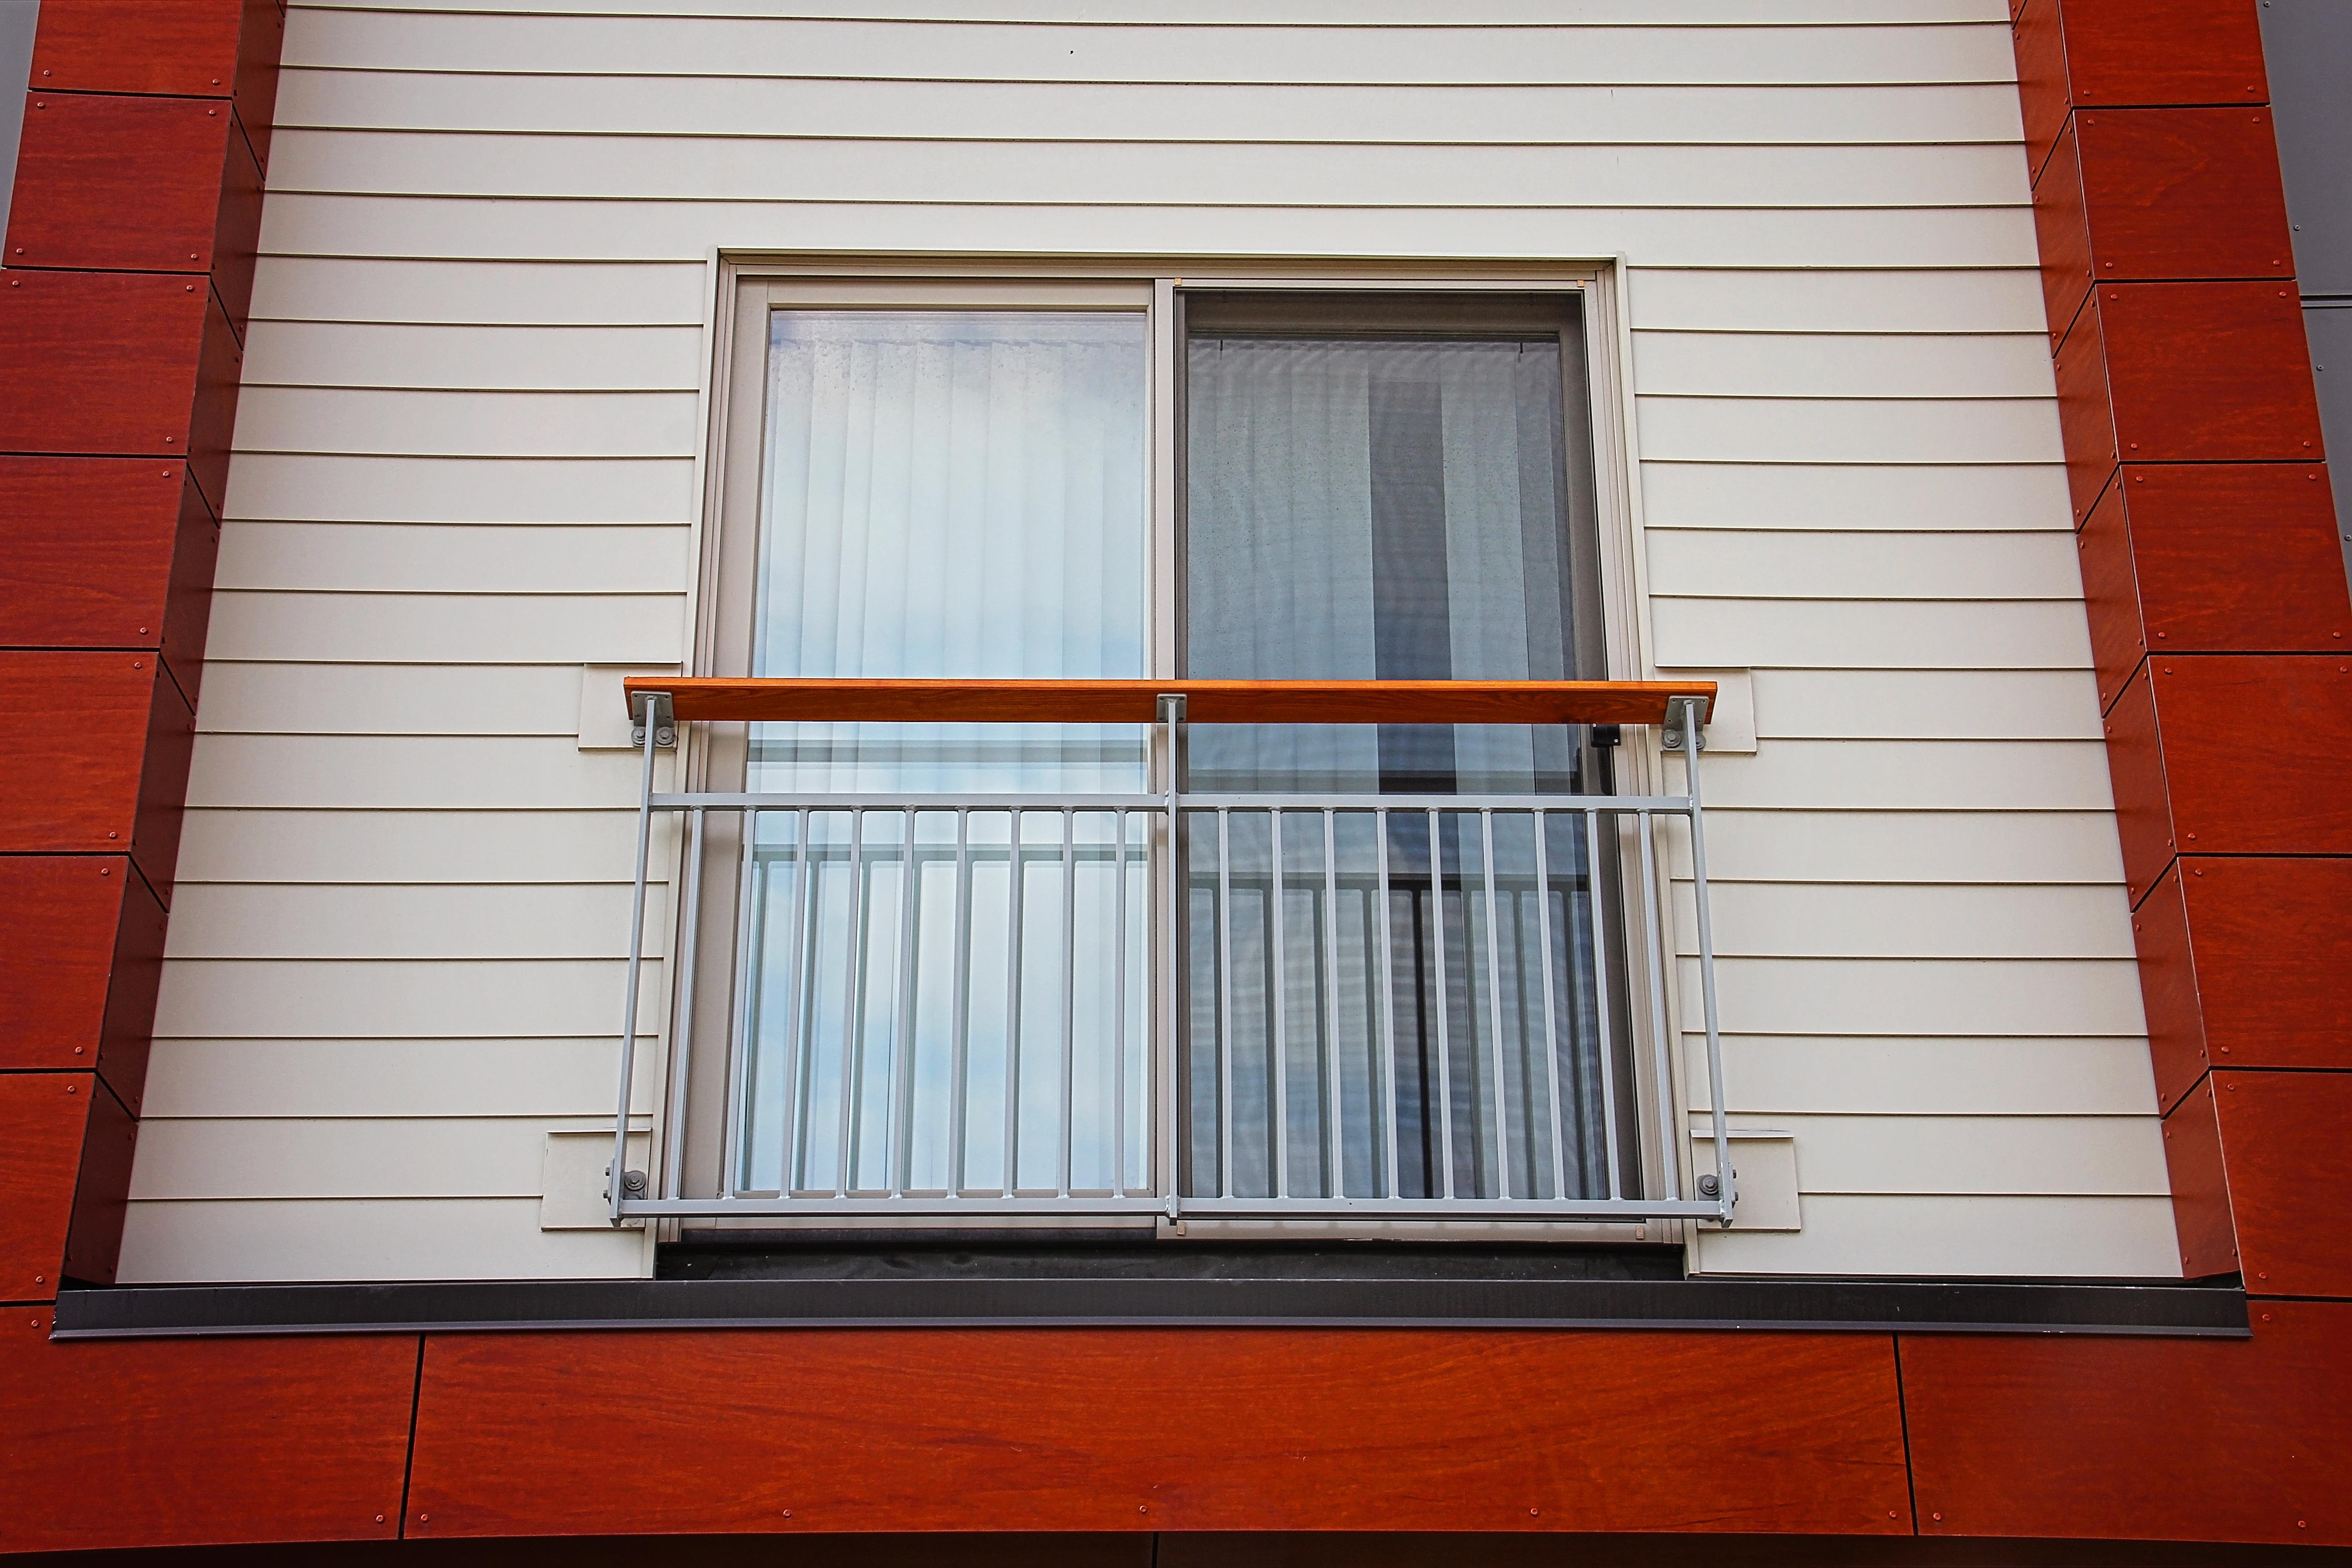 Wedge Point Balcony Railing